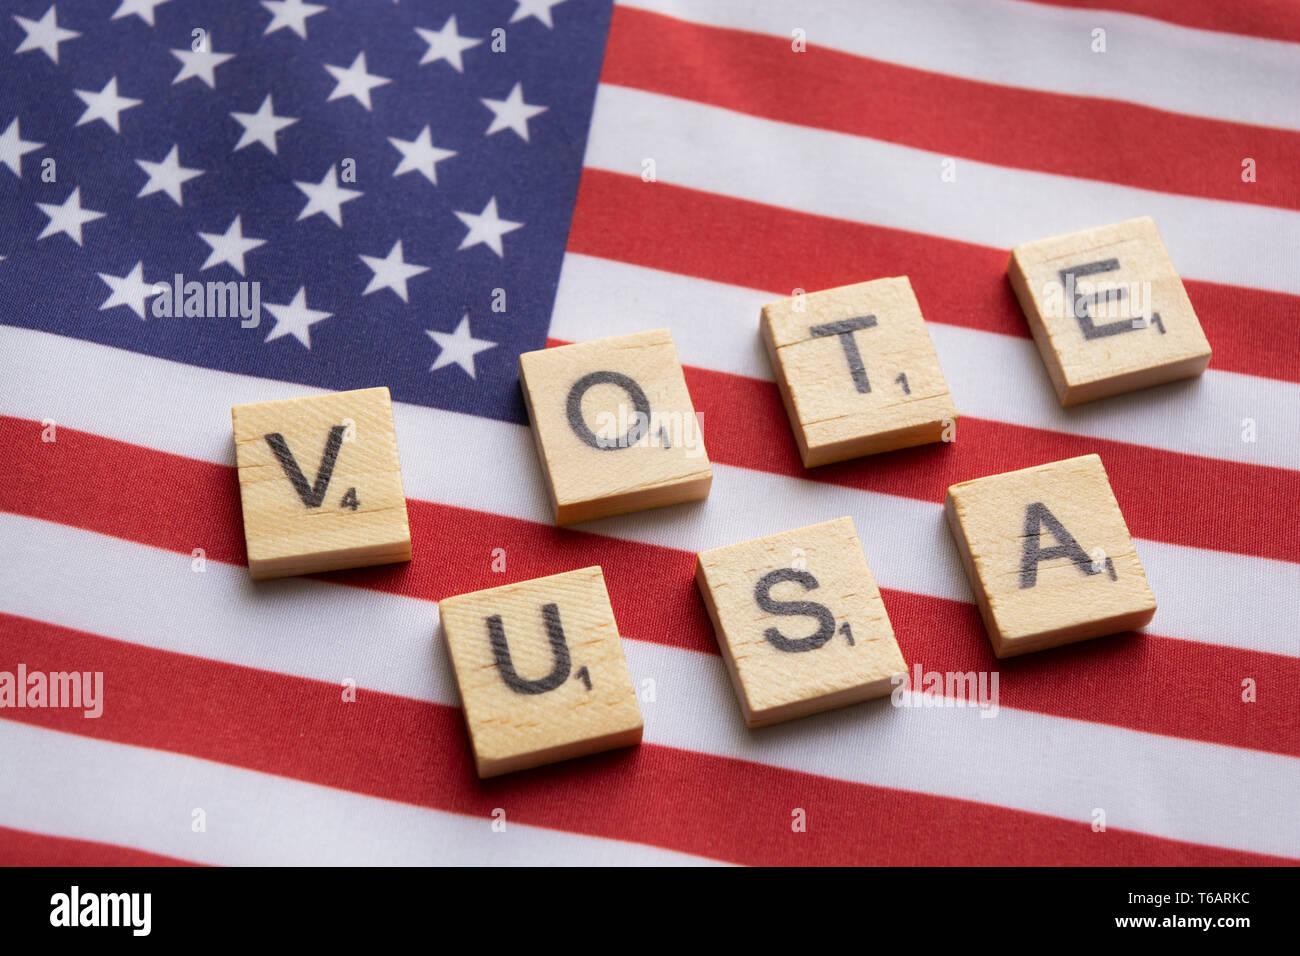 Maski, India 26, April 2019 : Vote USA wooden block letters on US flag - Stock Image